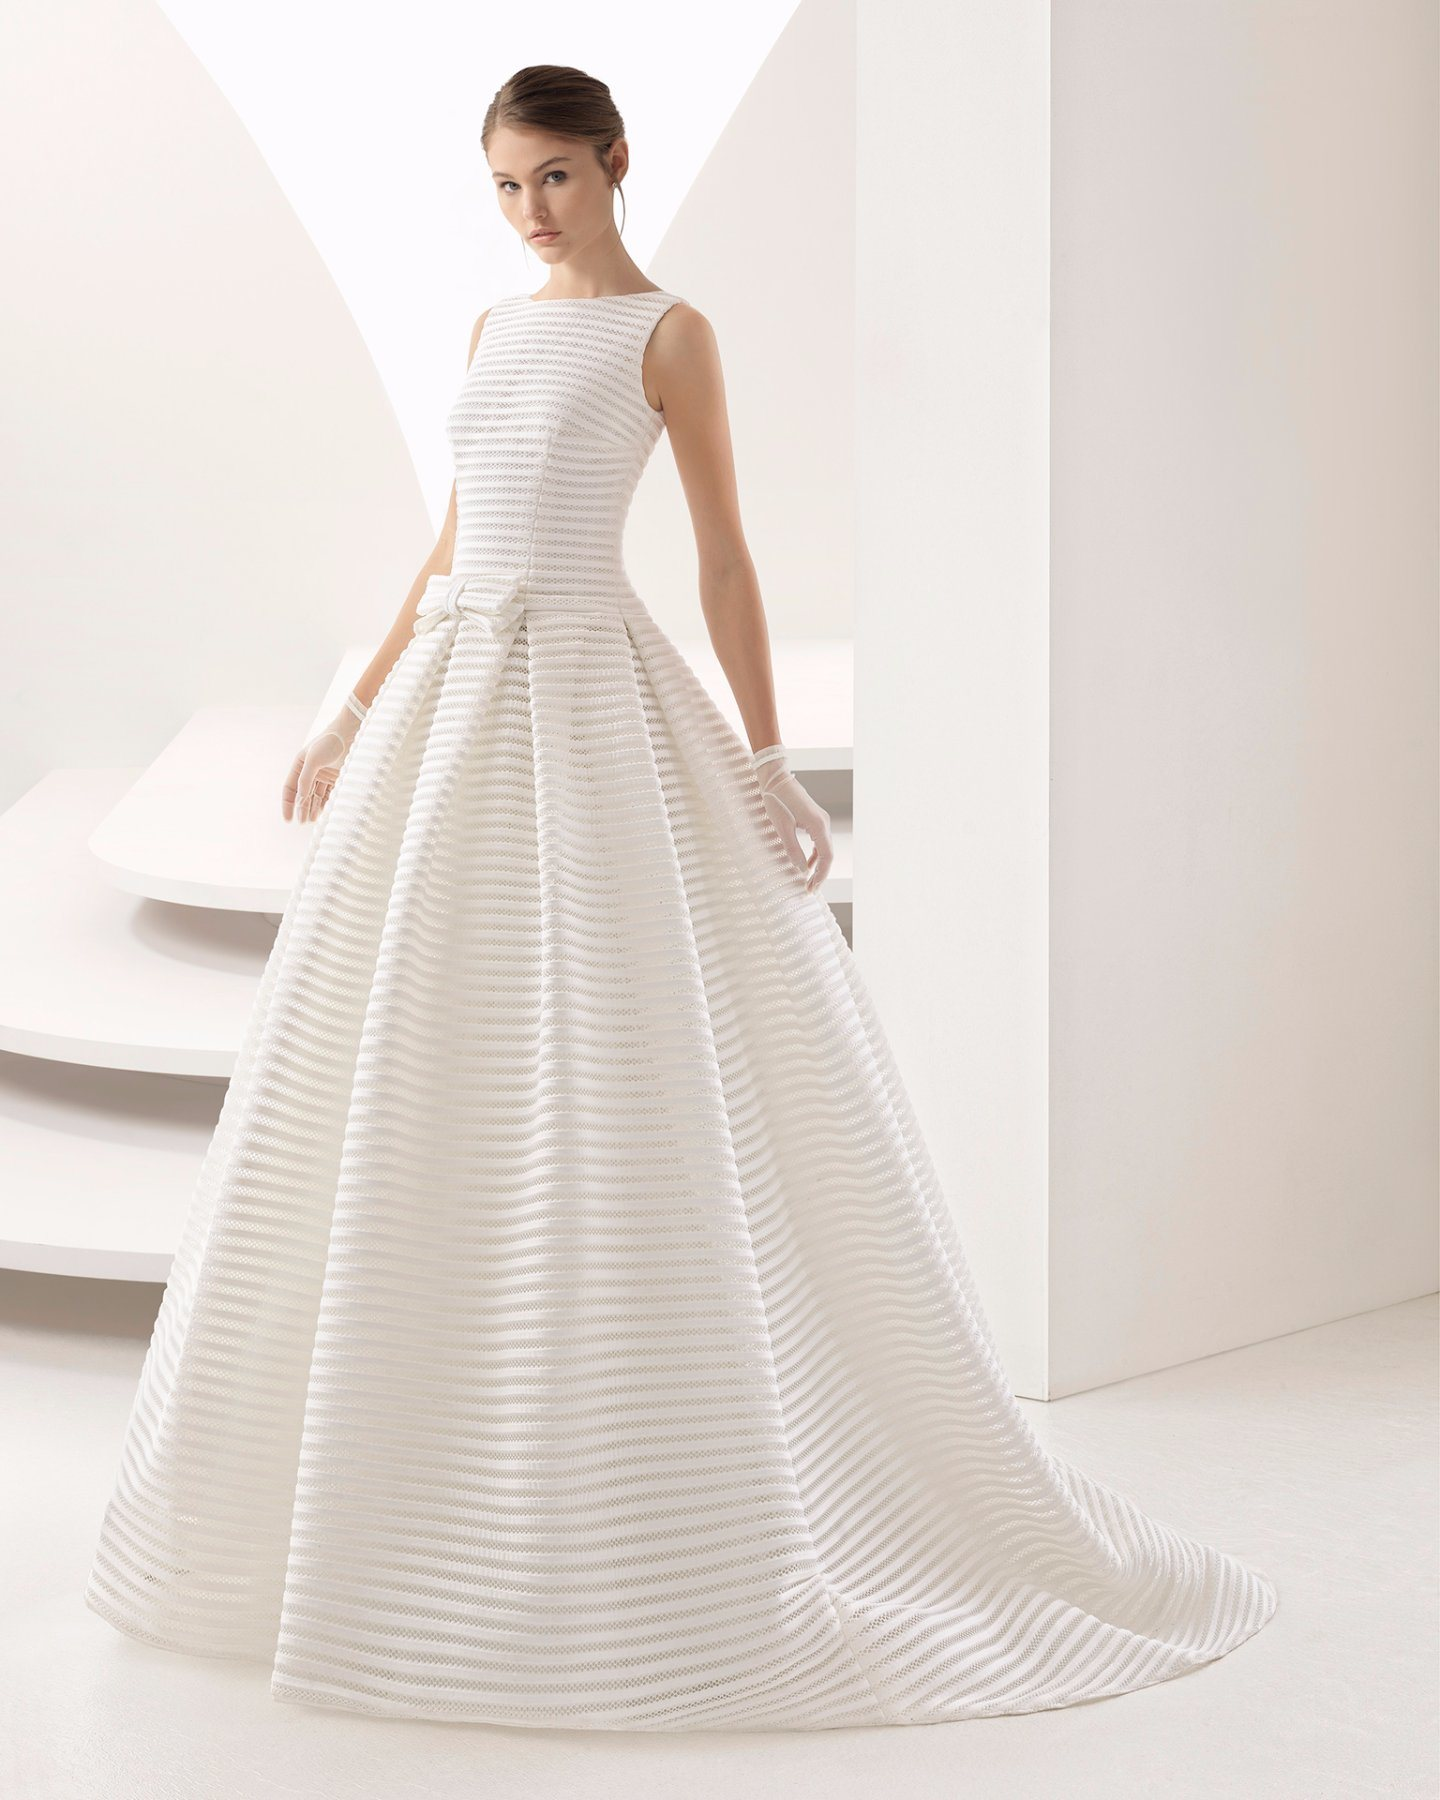 China Elegant Satin Ball Gown Bridal Gown Wedding Dress - China ...